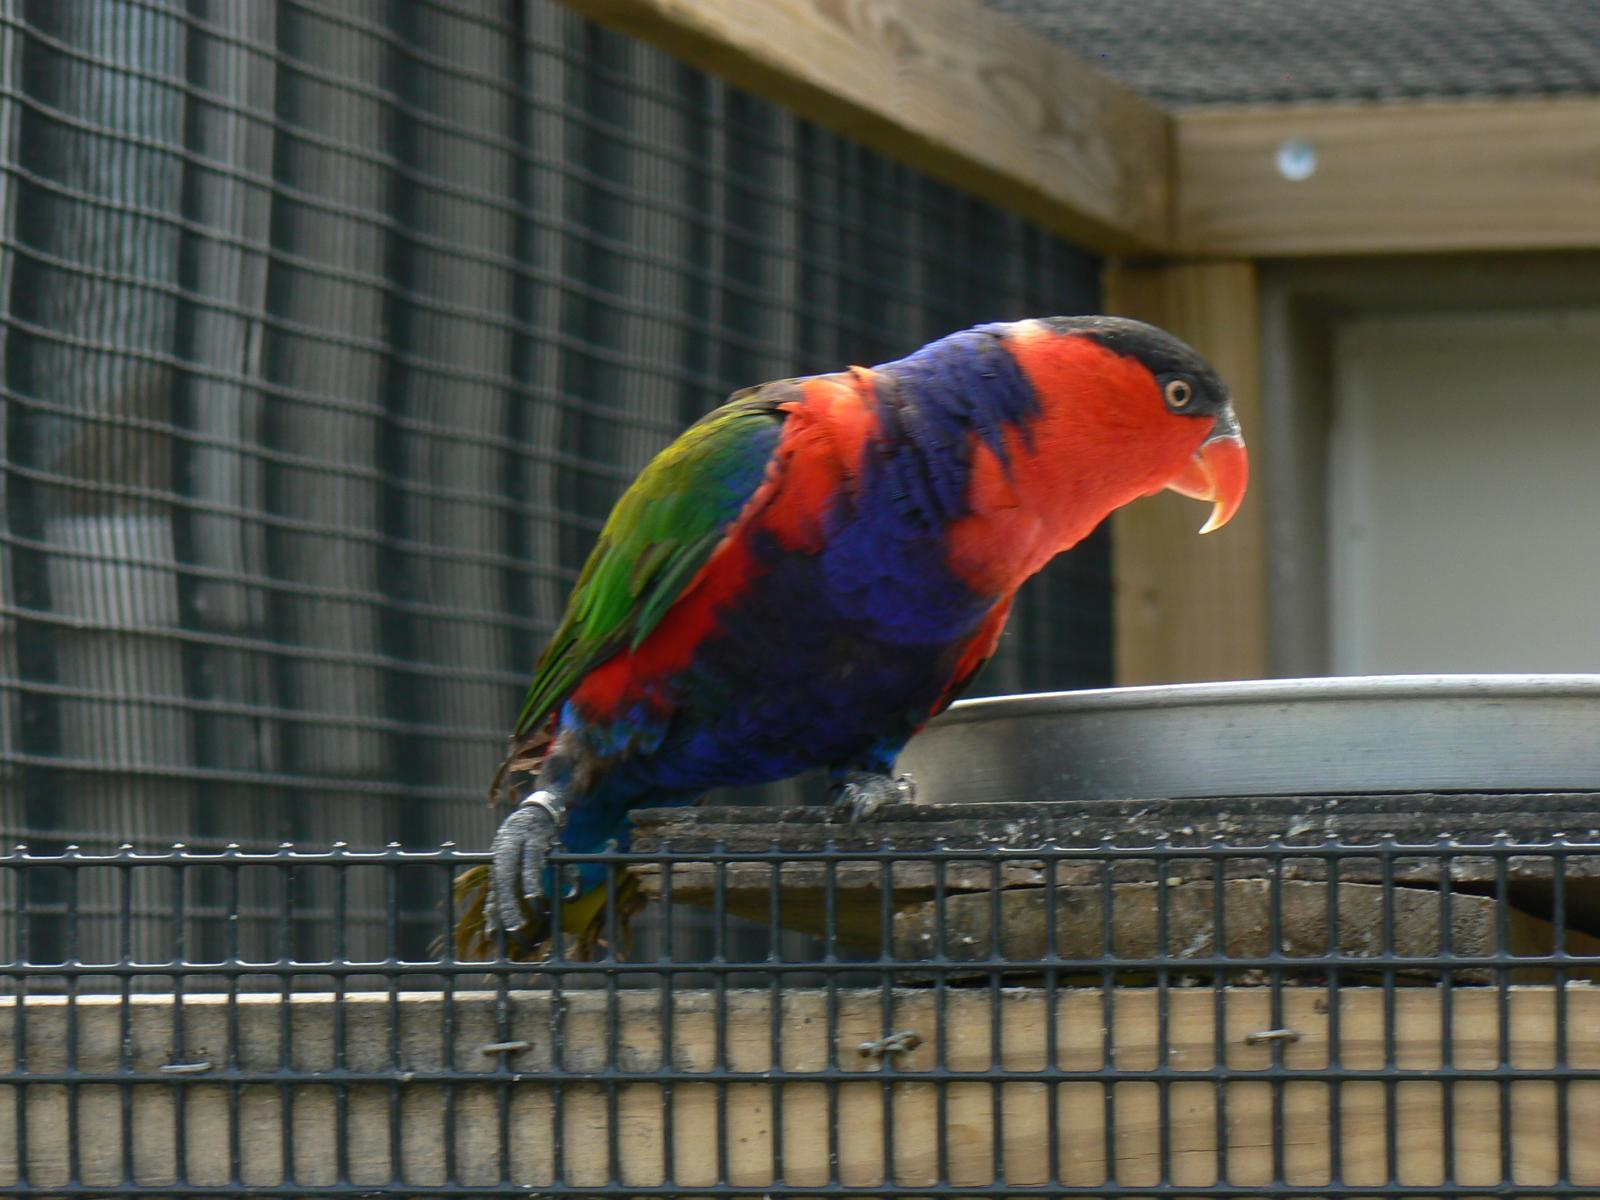 File:Lorius lory -Tanganyika Wildlife Park-8a jpg - Wikimedia Commons